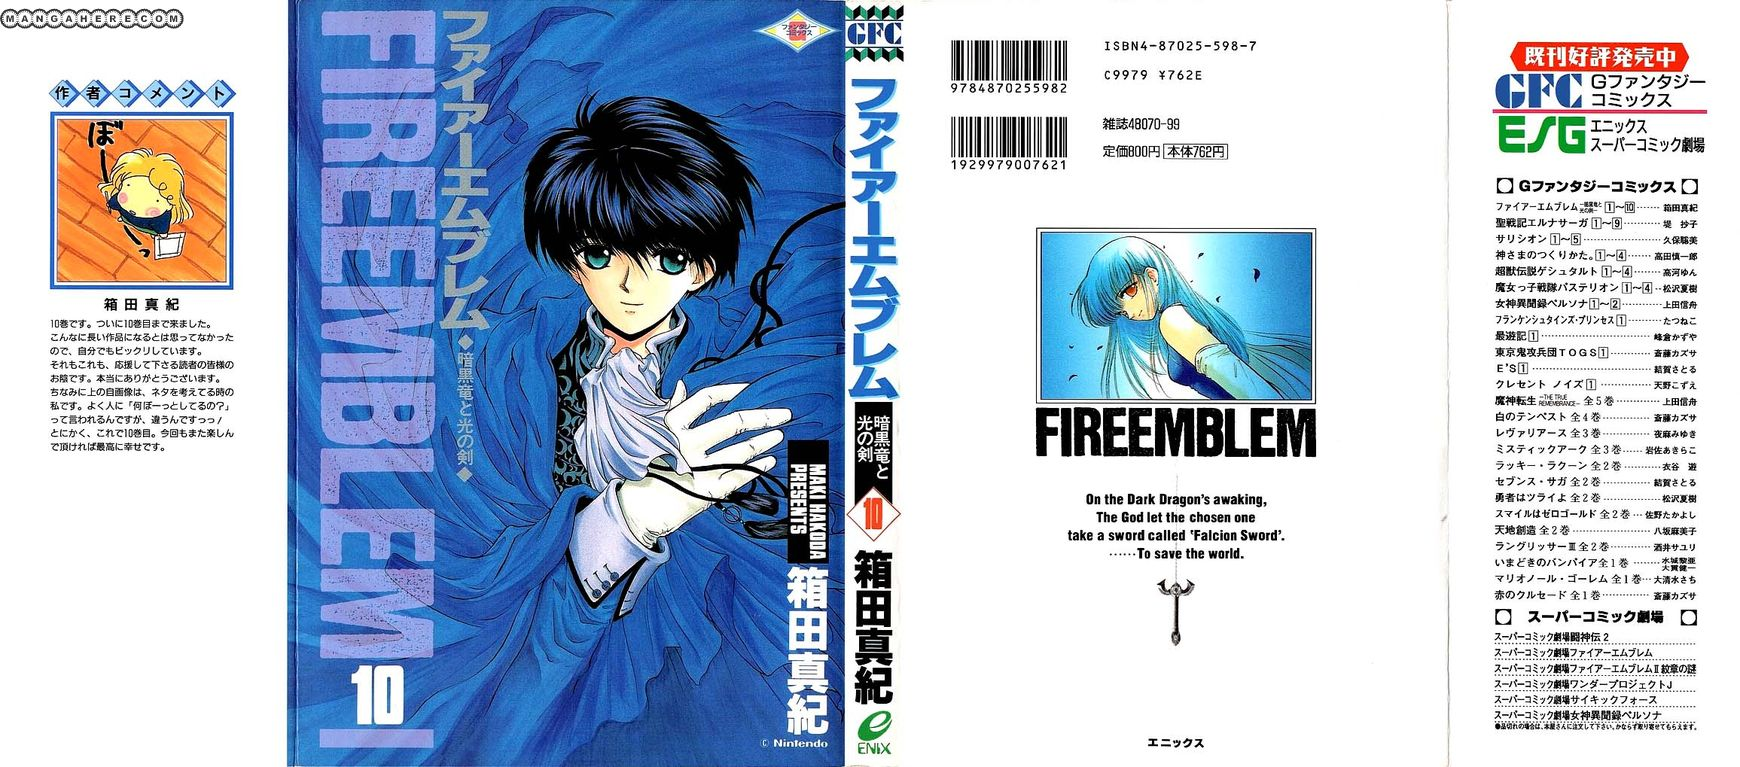 Fire Emblem: Ankokuryuu to Hikari no Ken 44 Page 1